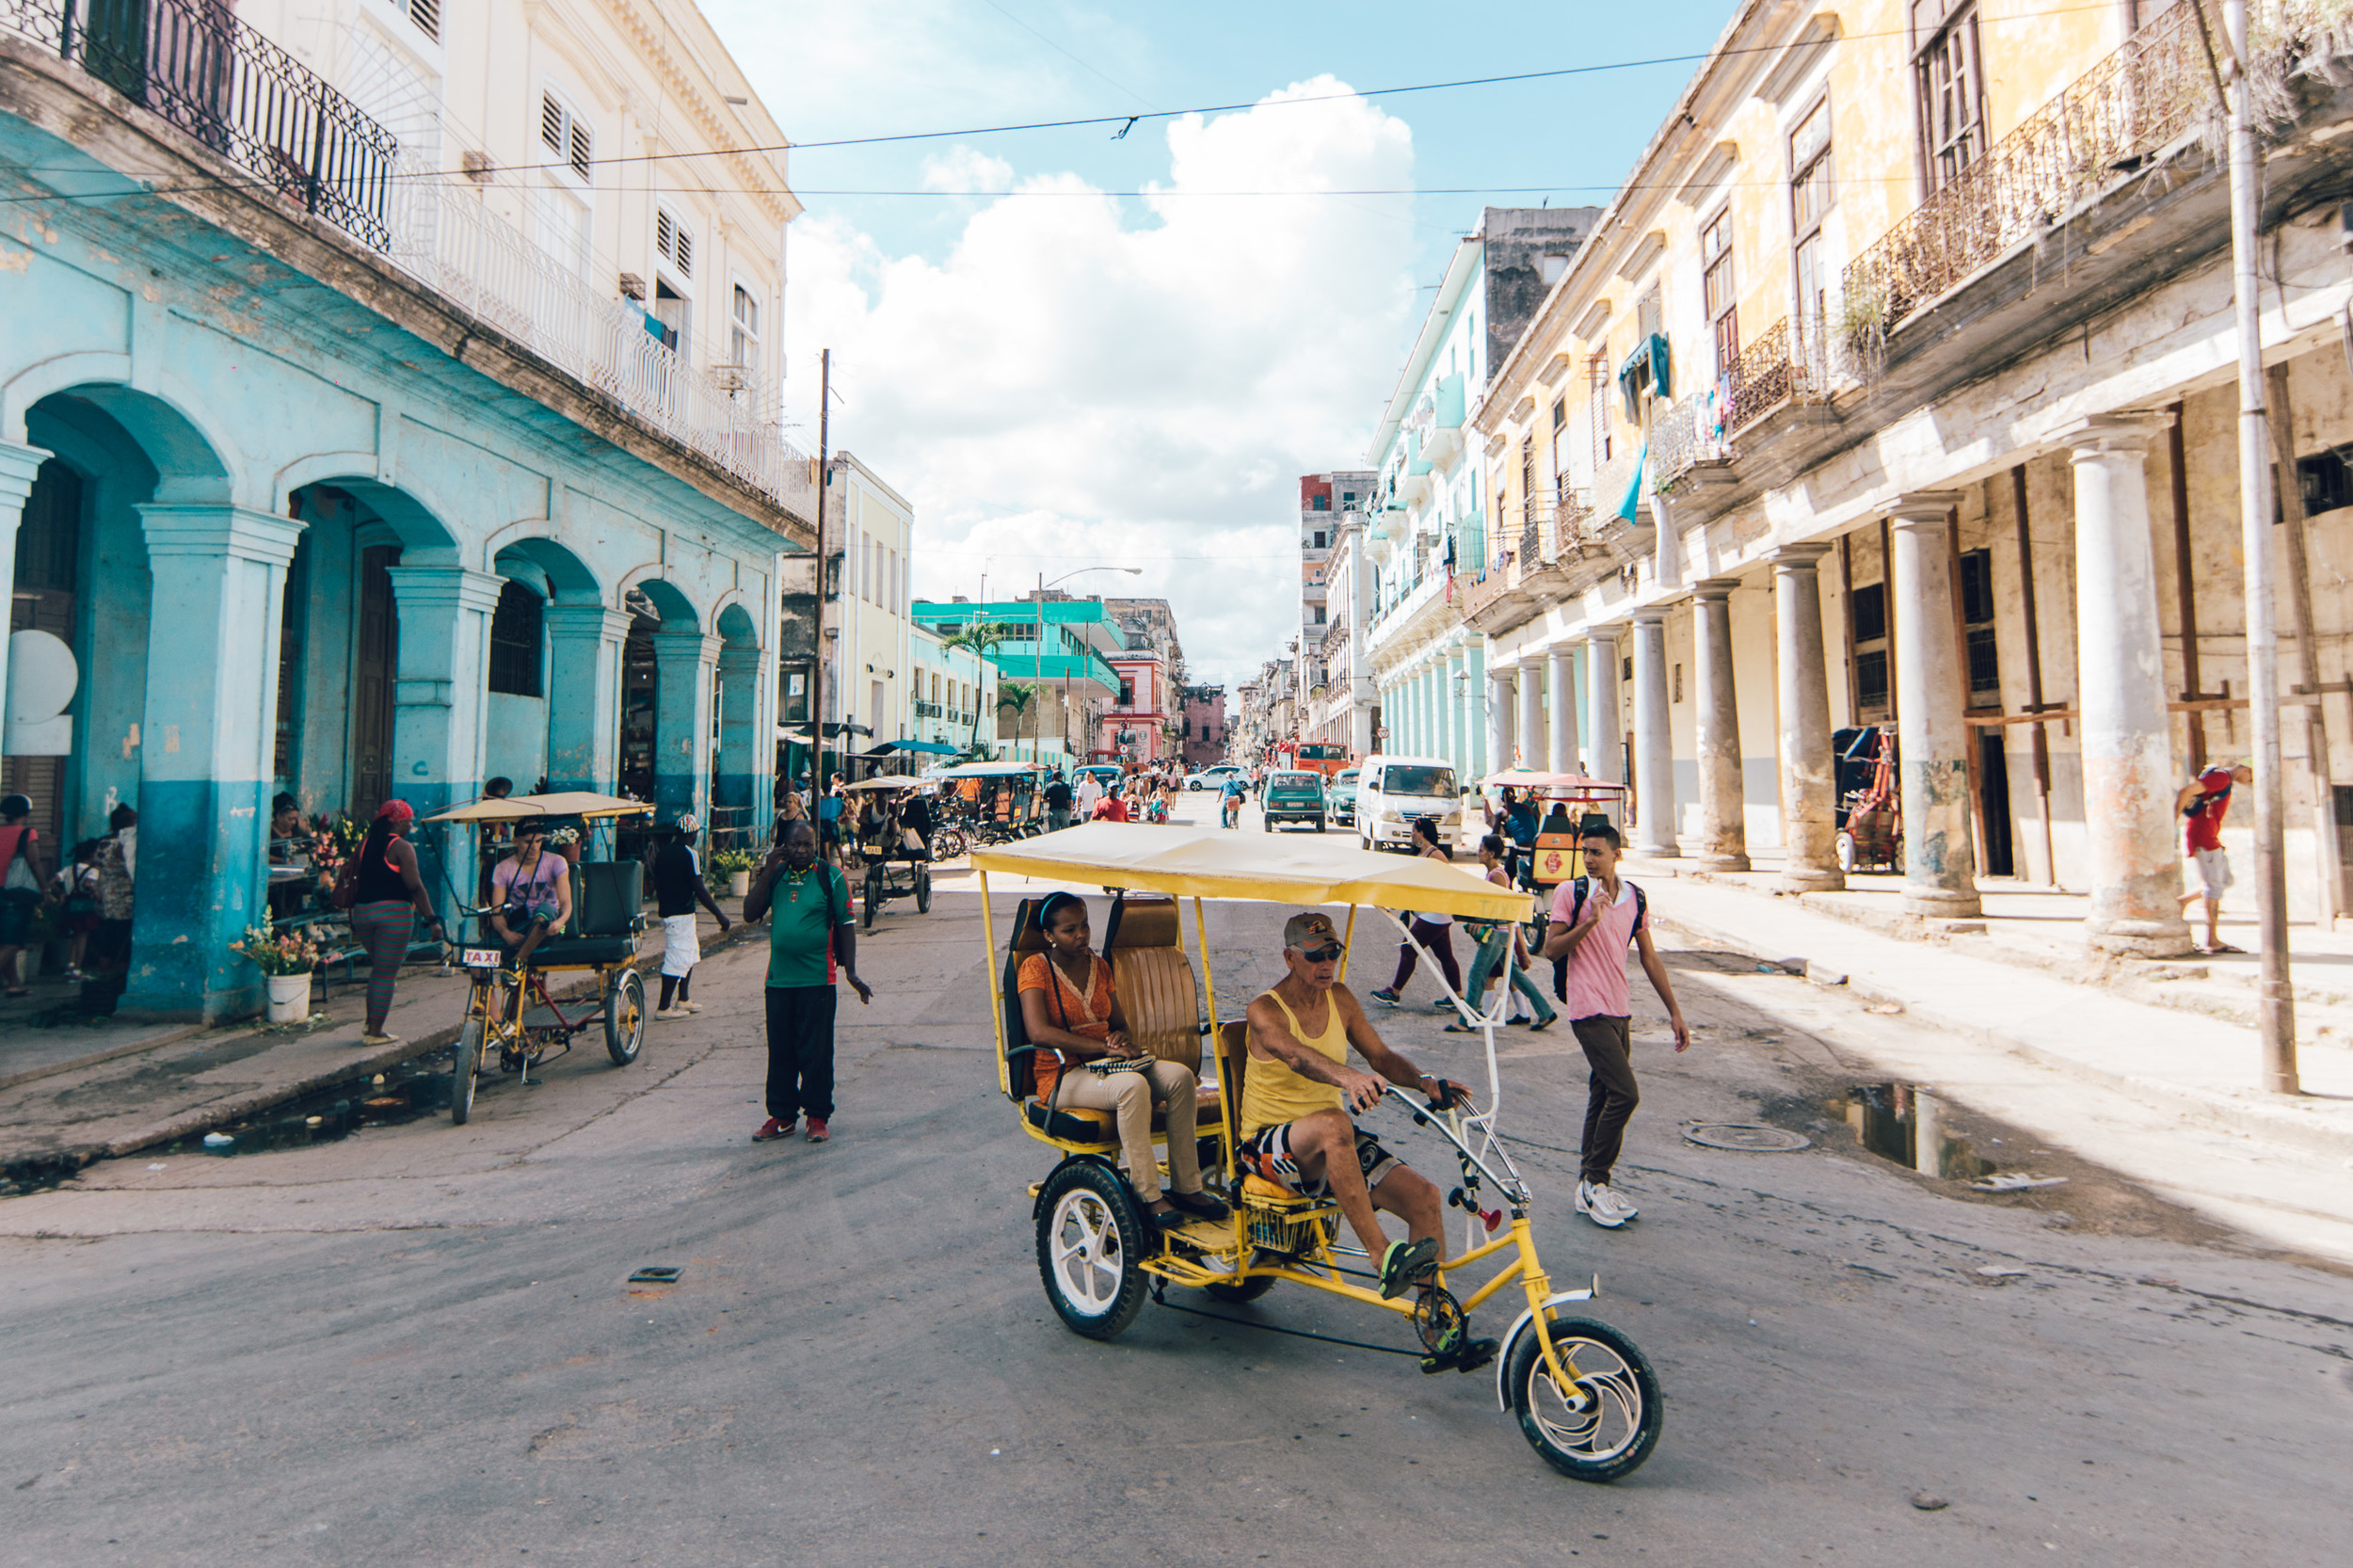 DeClaro-Photography-Cuba-02396.jpg